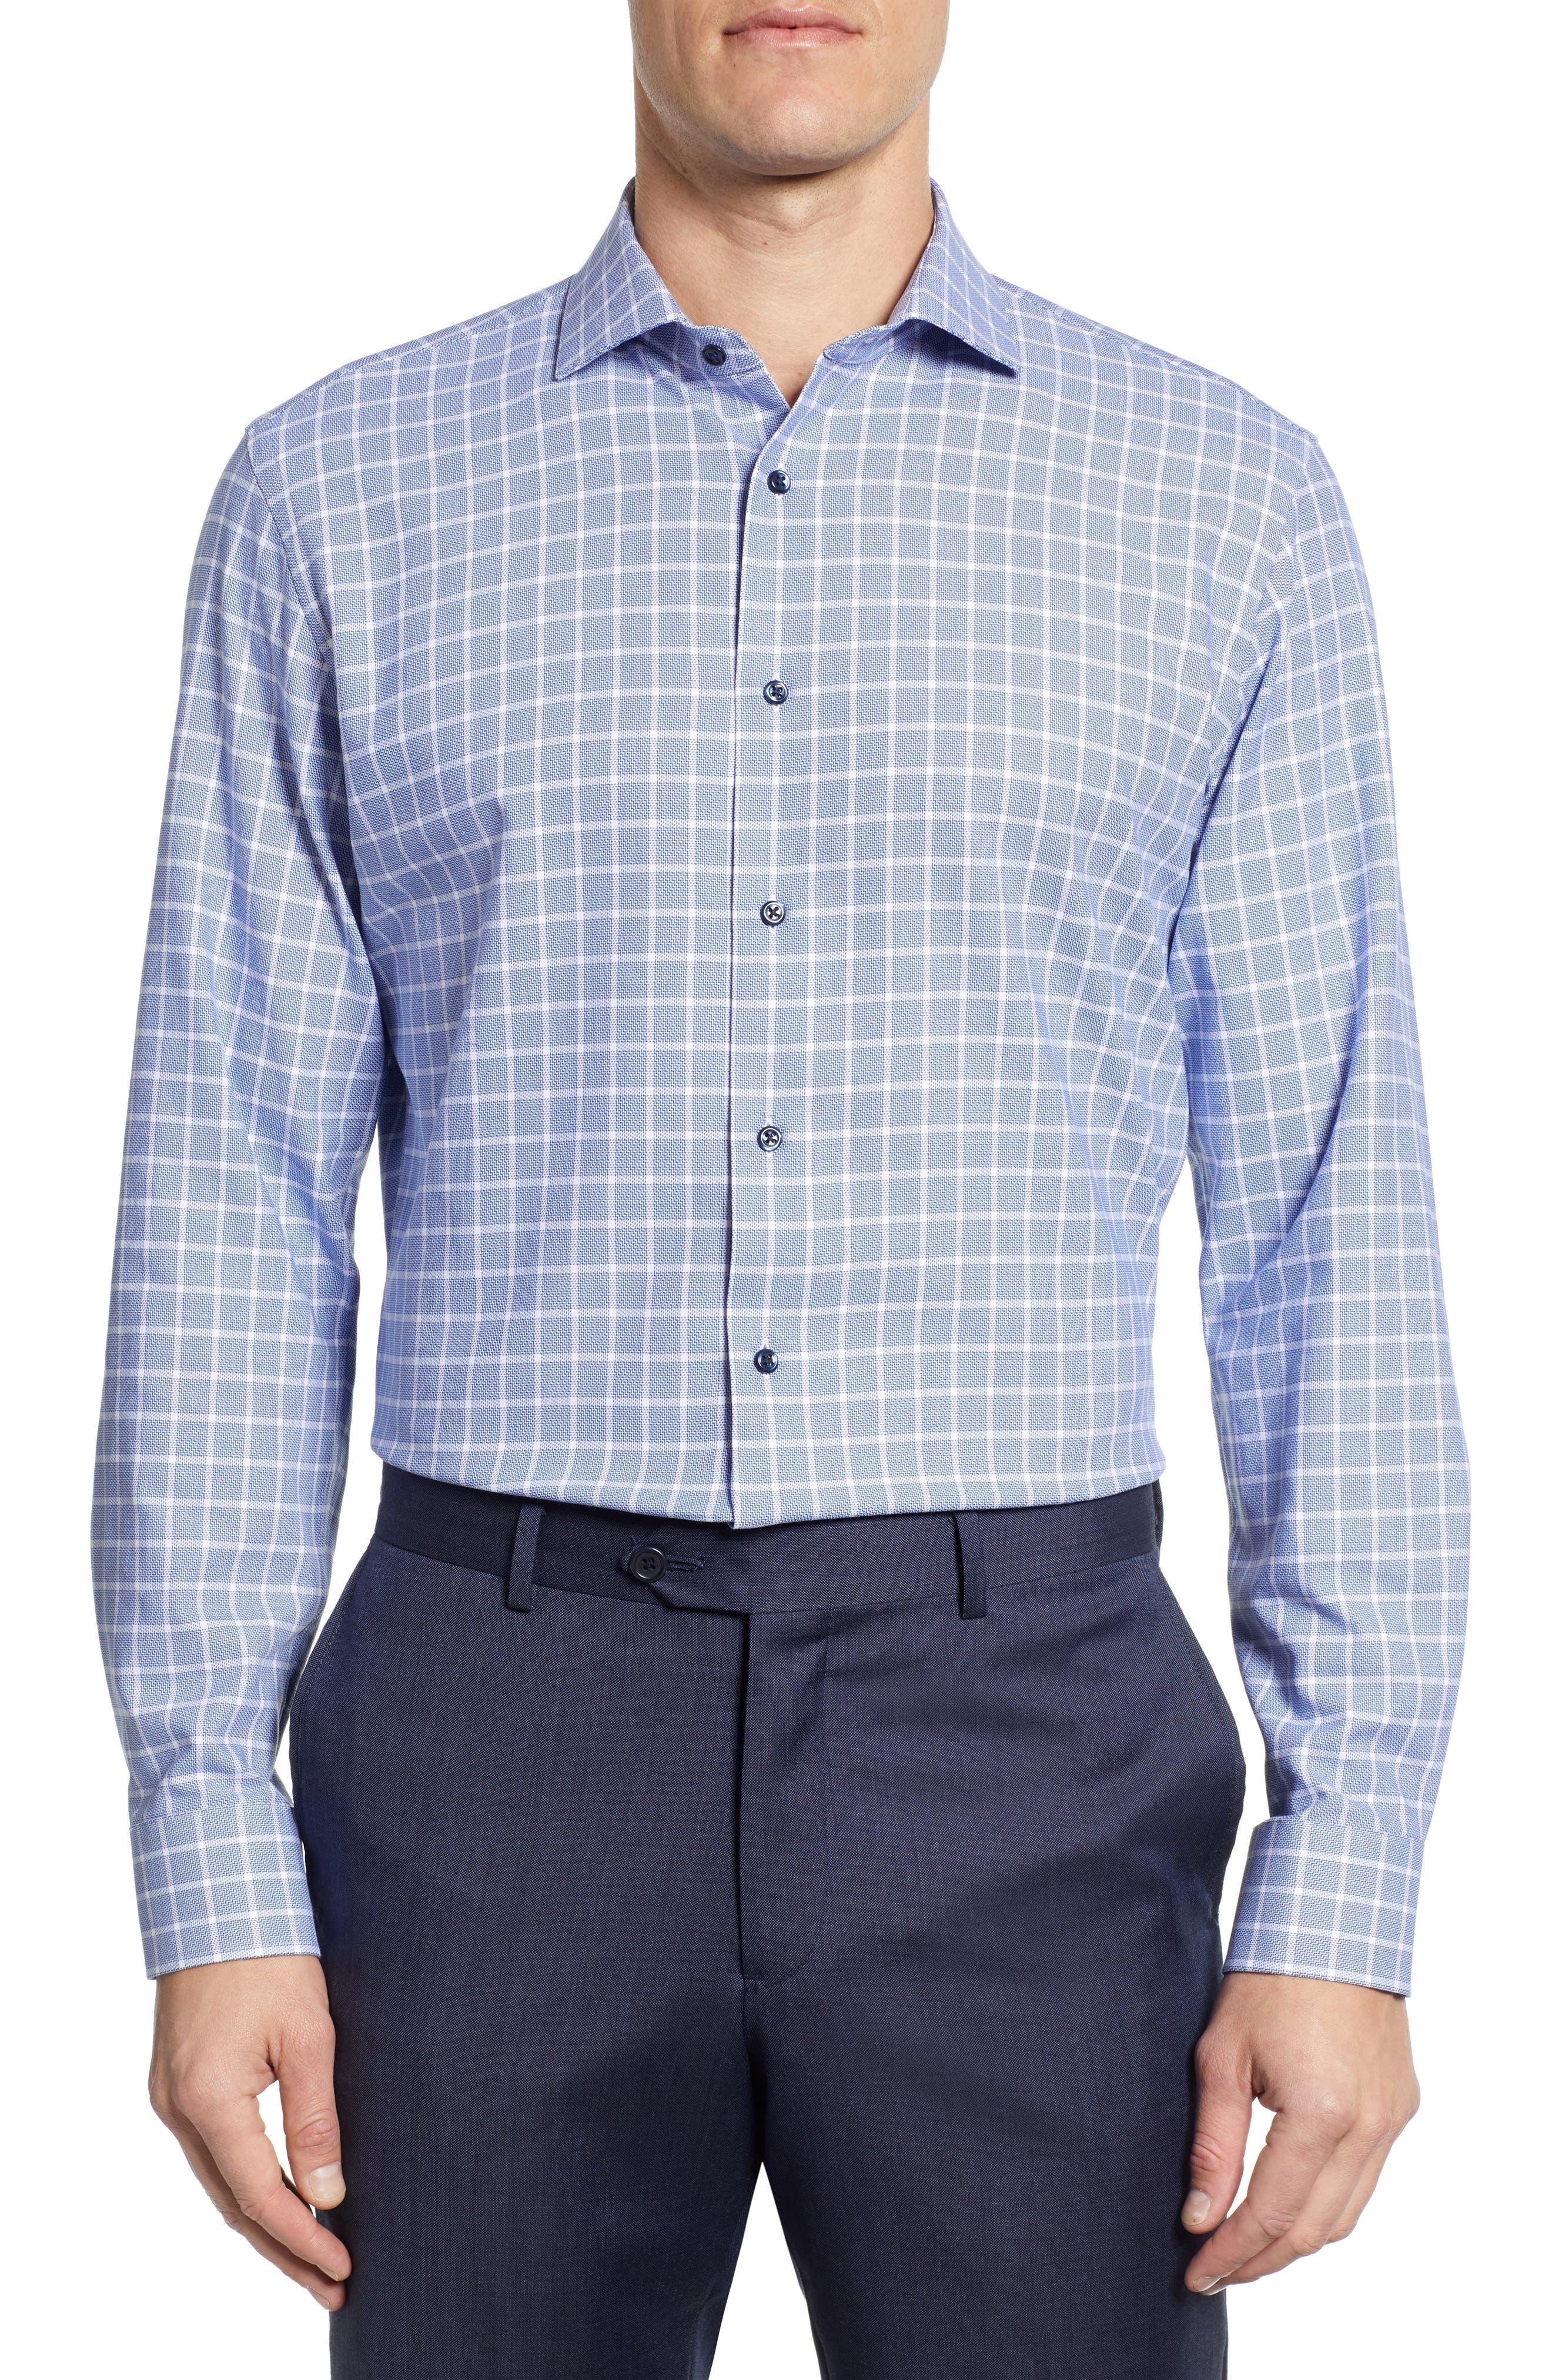 Tech-Smart Trim Fit Stretch Plaid Dress Shirt, Main, color, 410